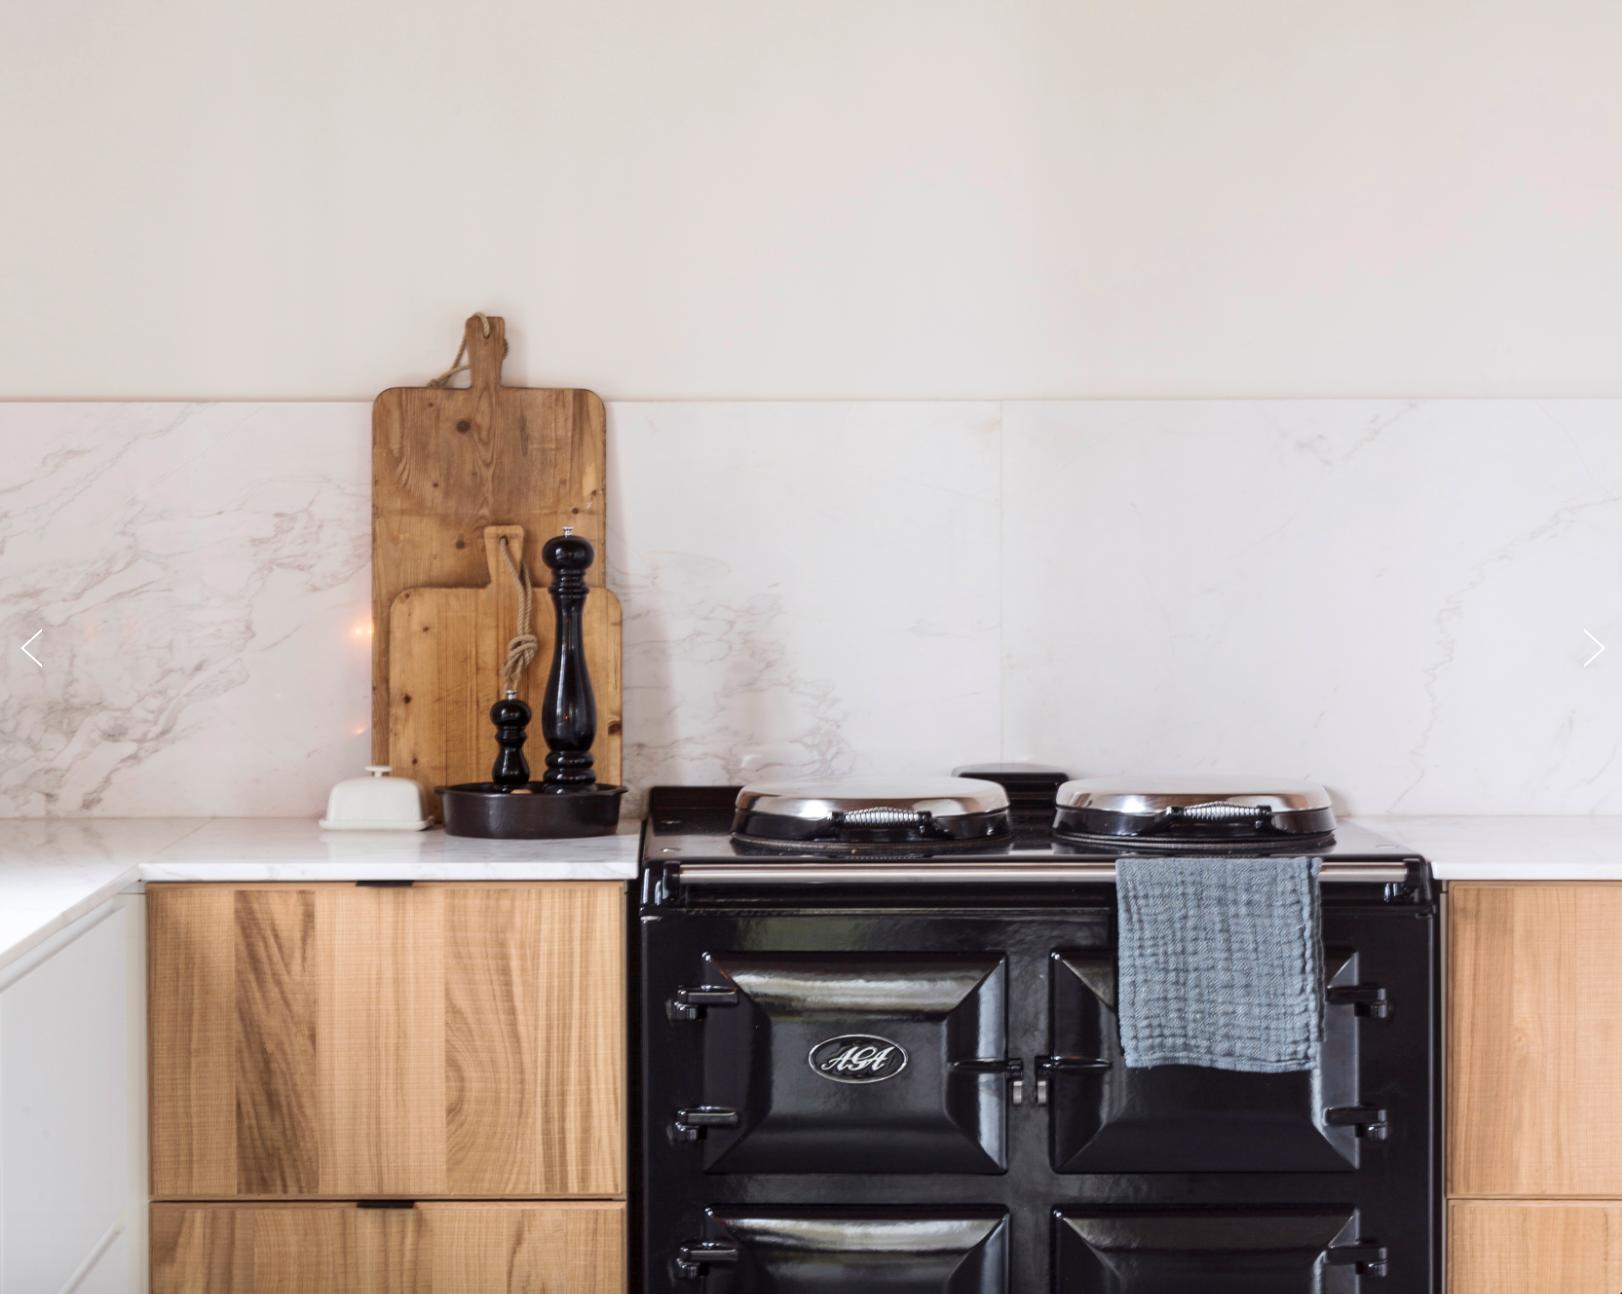 Klassiek Aga Fornuis Geintegreerd In Moderne Ikea Keuken Strak